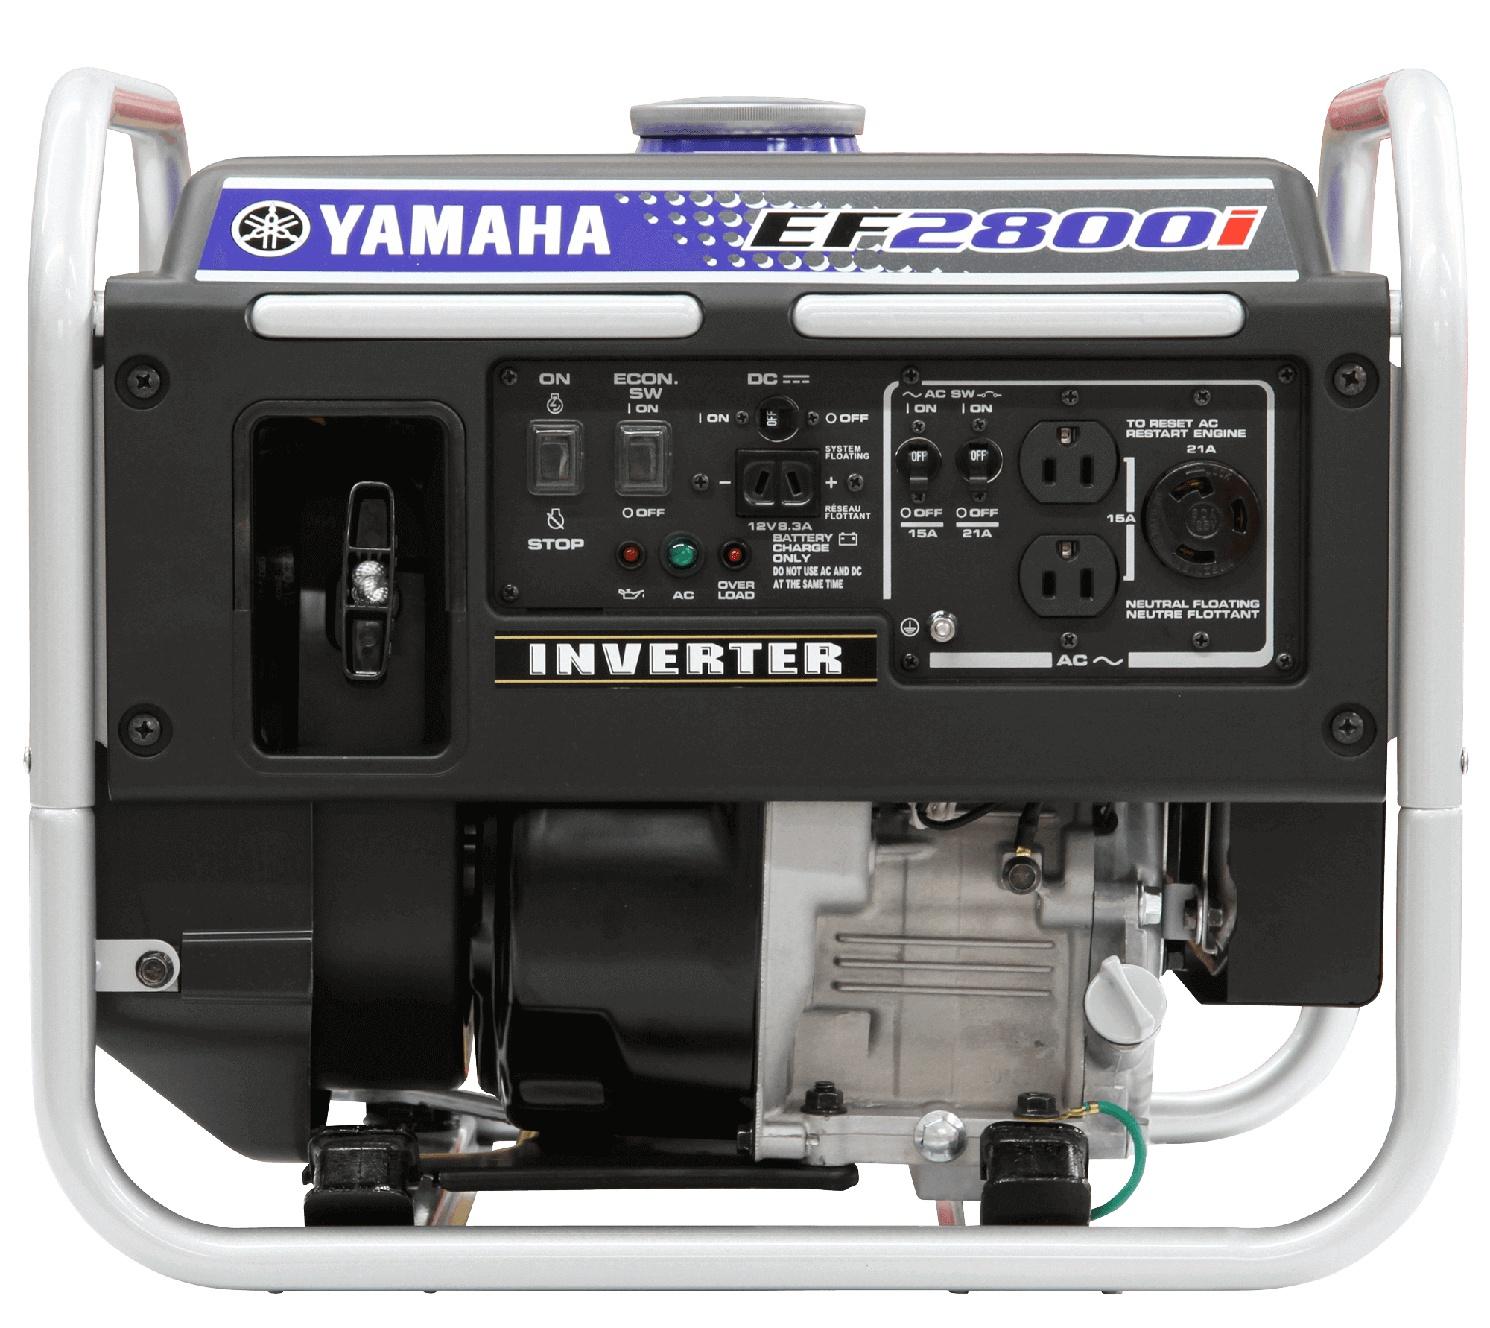 Yamaha Génératrices à inverseur EF2800I